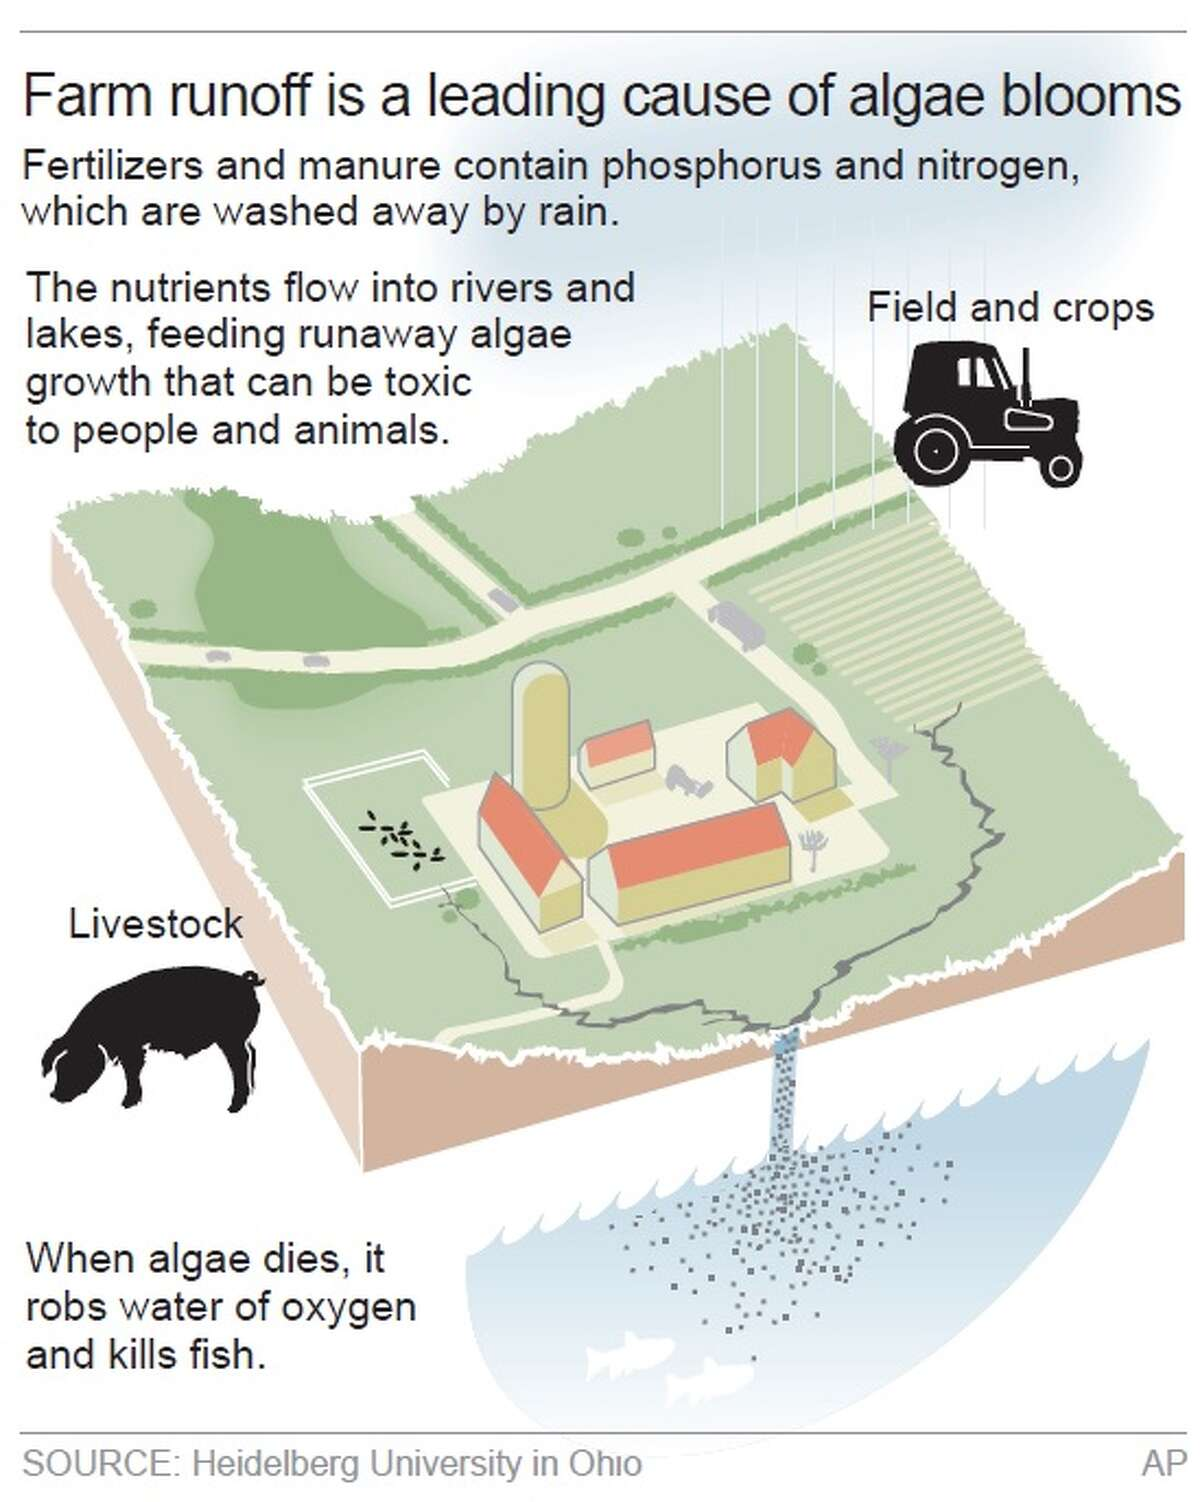 AP Explains: Farm runoff causes toxic algae blooms.